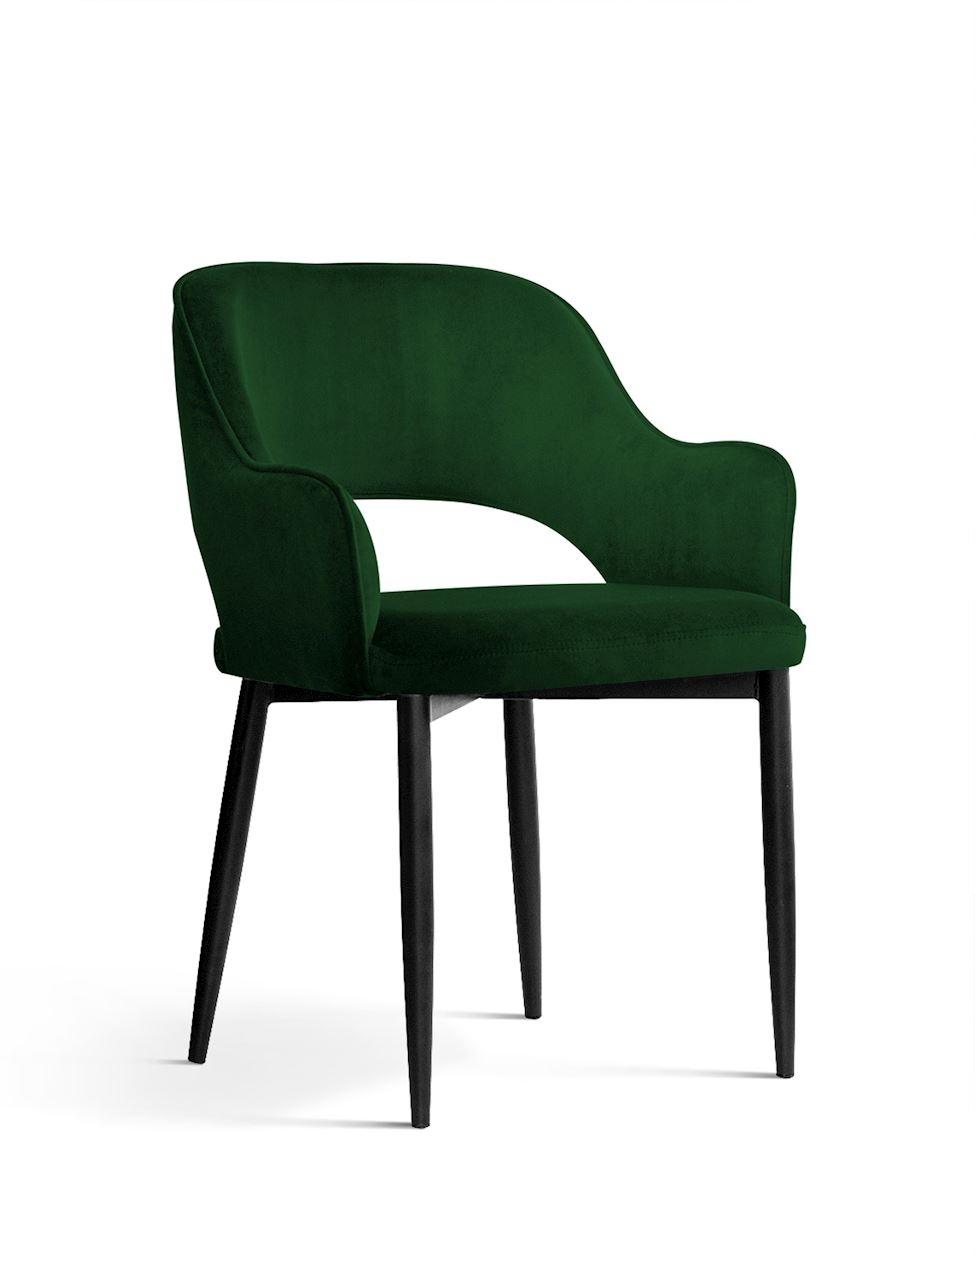 Scaun tapitat cu stofa, cu picioare metalice Mercy Green / Black, l53xA60xH79 cm